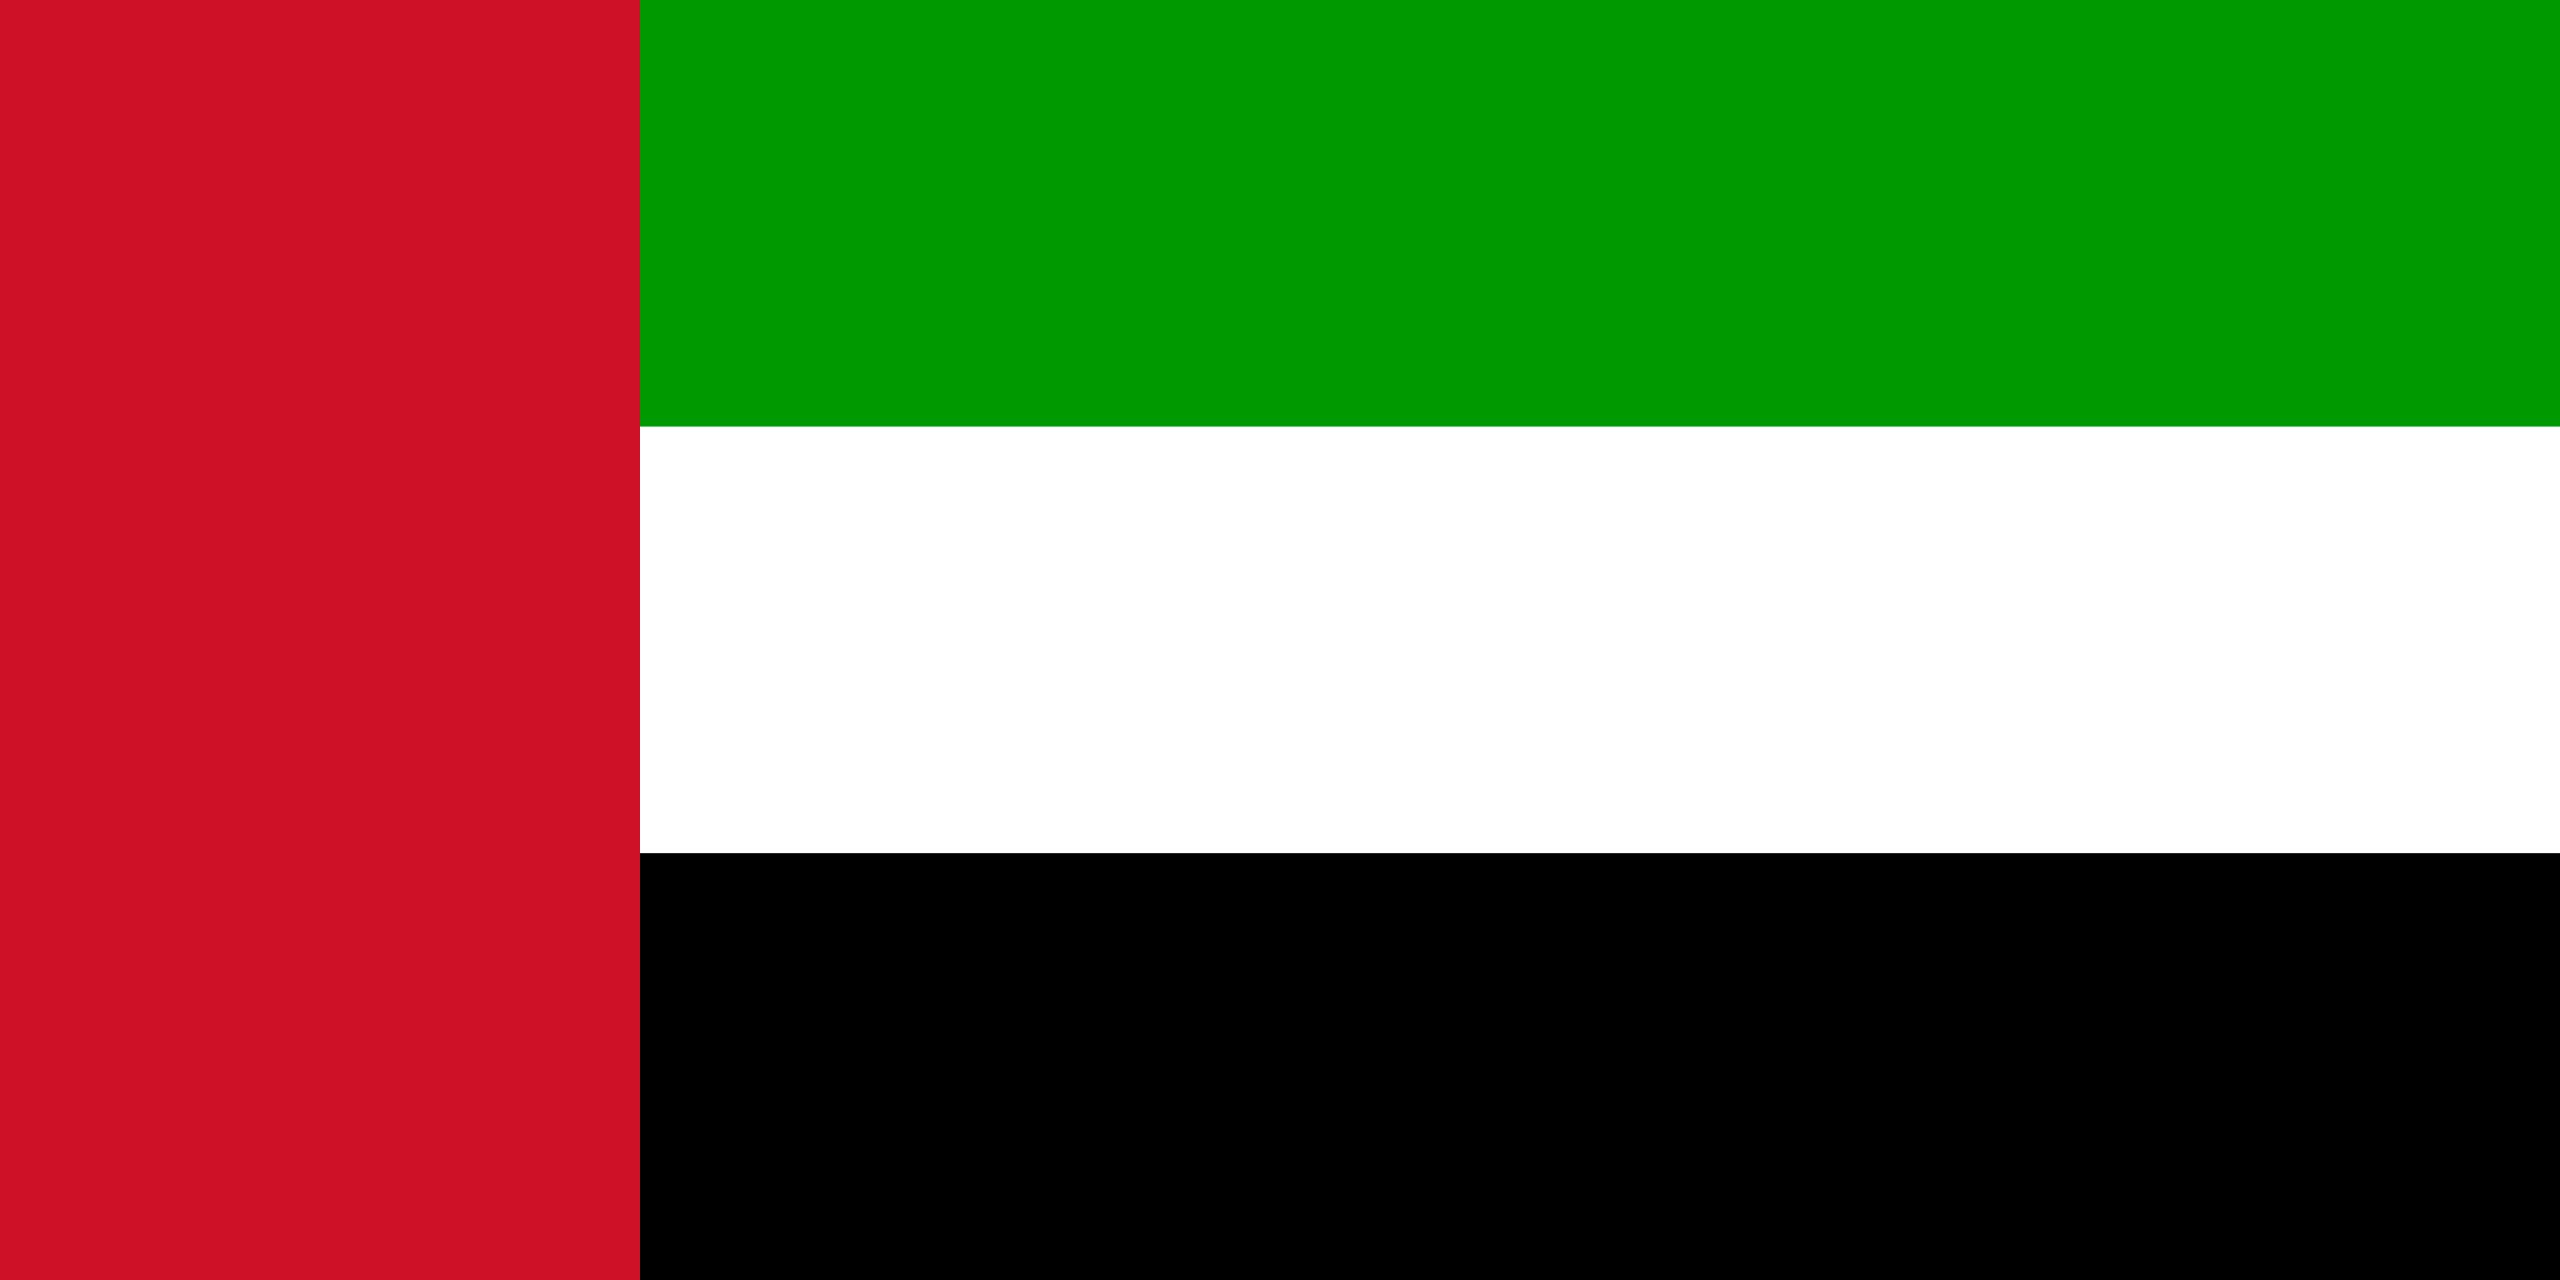 Émirats Arabes Unis, pays, emblème, logo, symbole - Fonds d'écran HD - Professor-falken.com